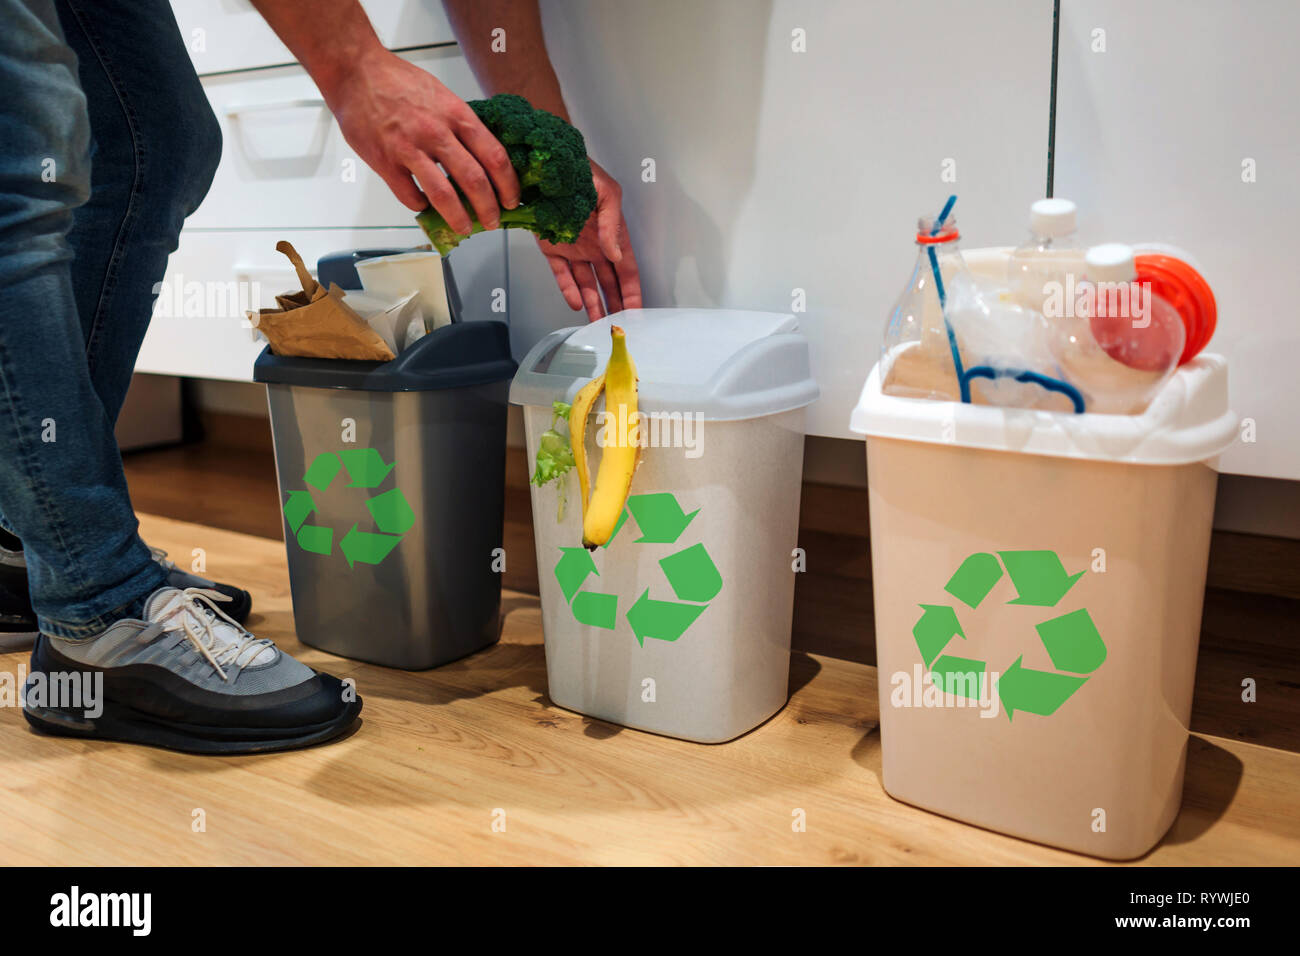 Abfall Papierkorb Stockfotos und  bilder Kaufen   Alamy